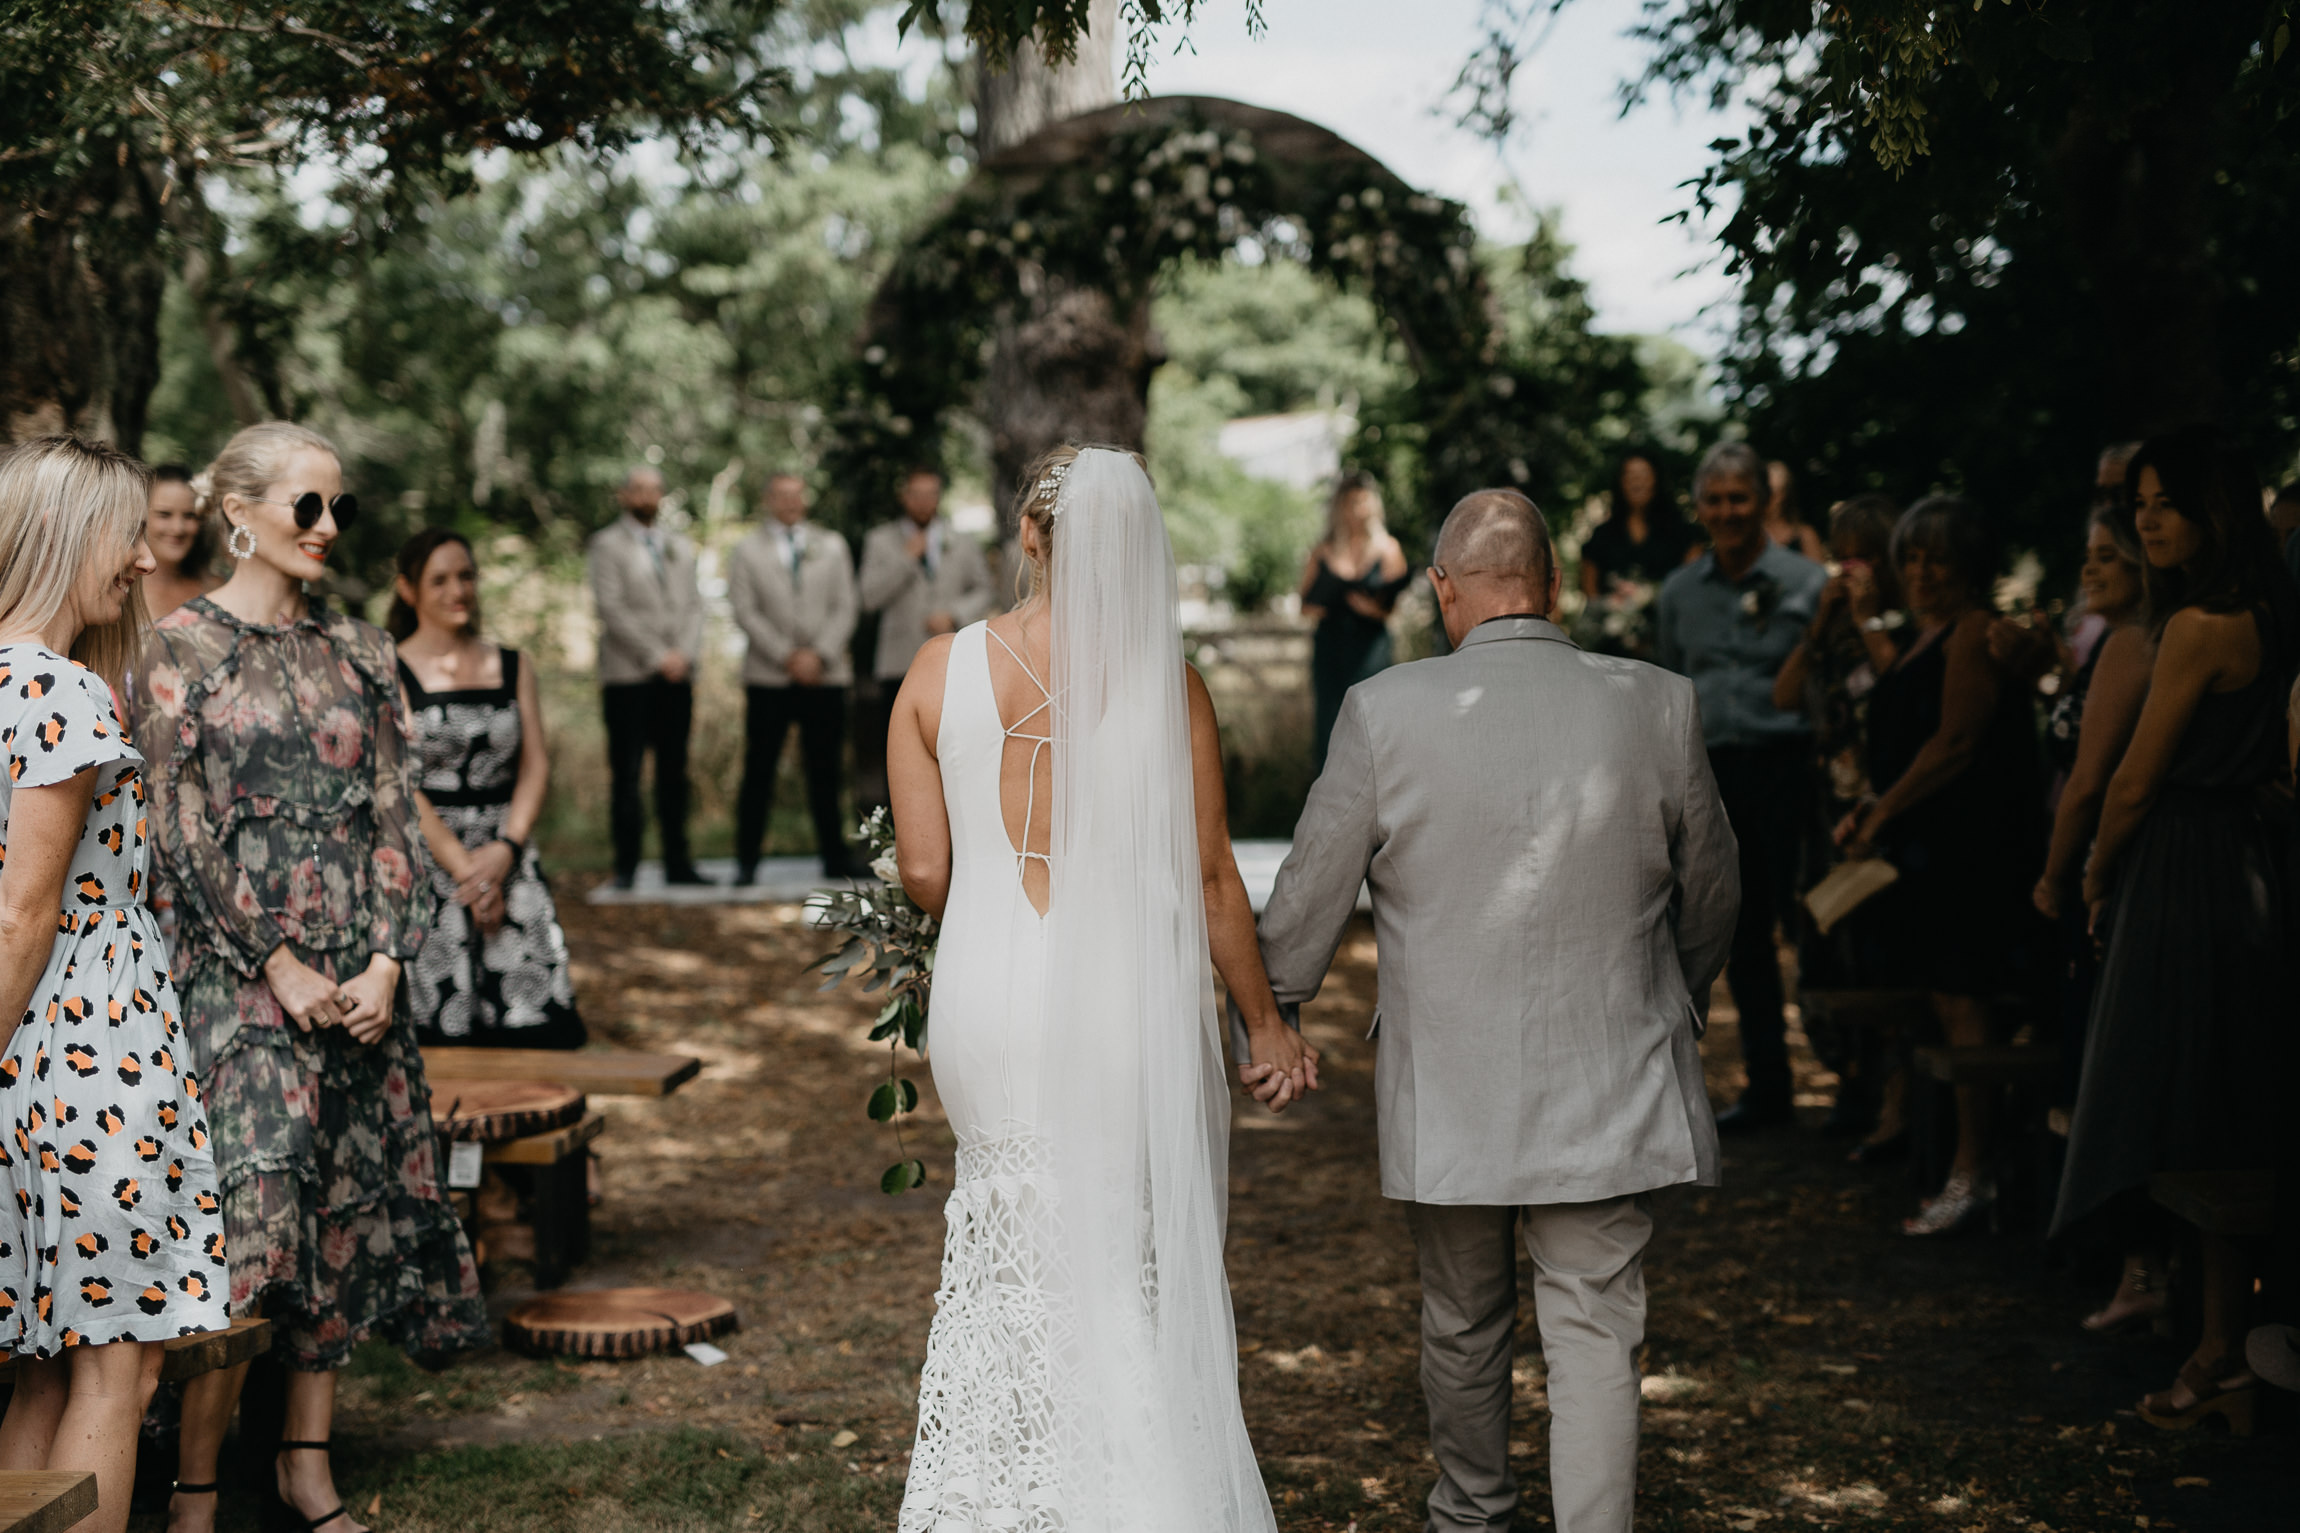 oldforestschool-wedding-blog-100.jpg